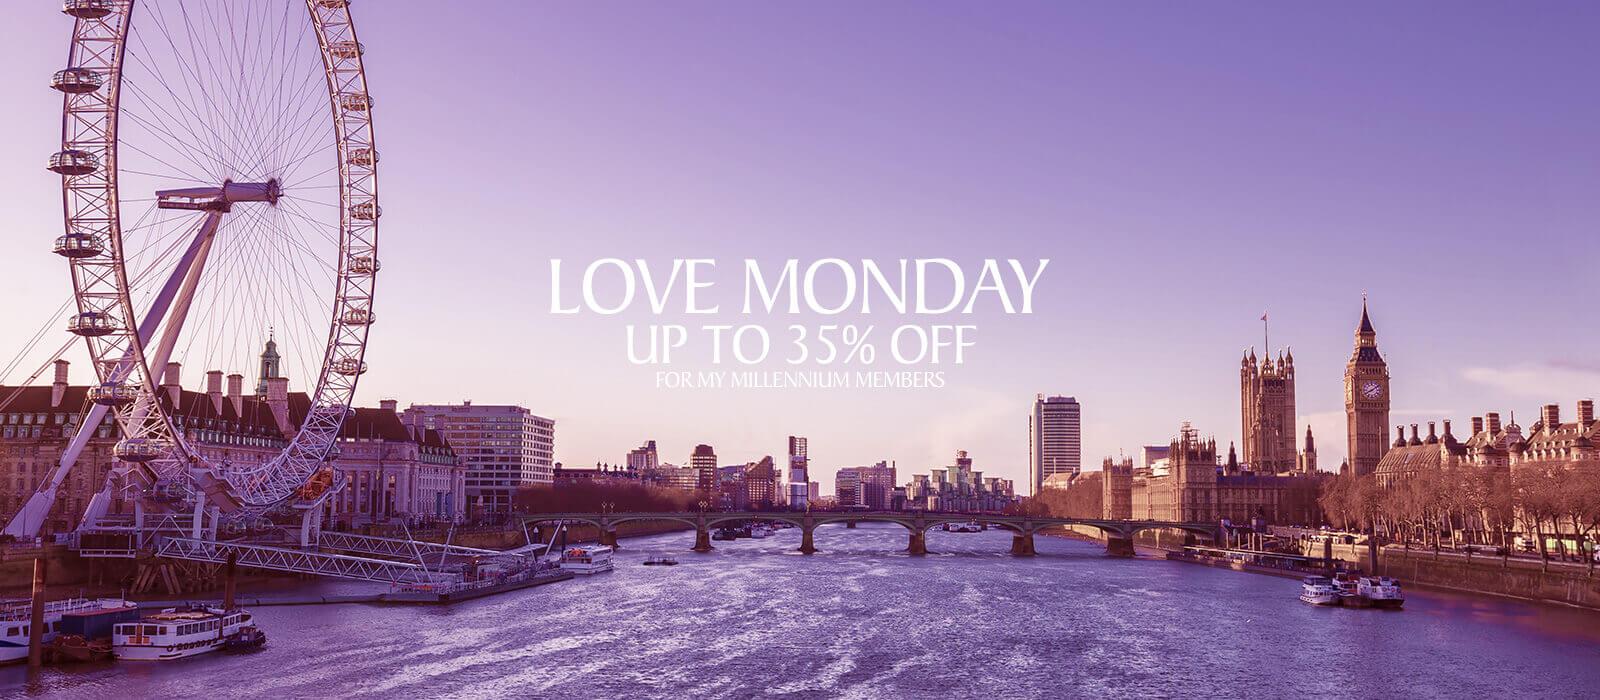 Desktop_Love_Monday